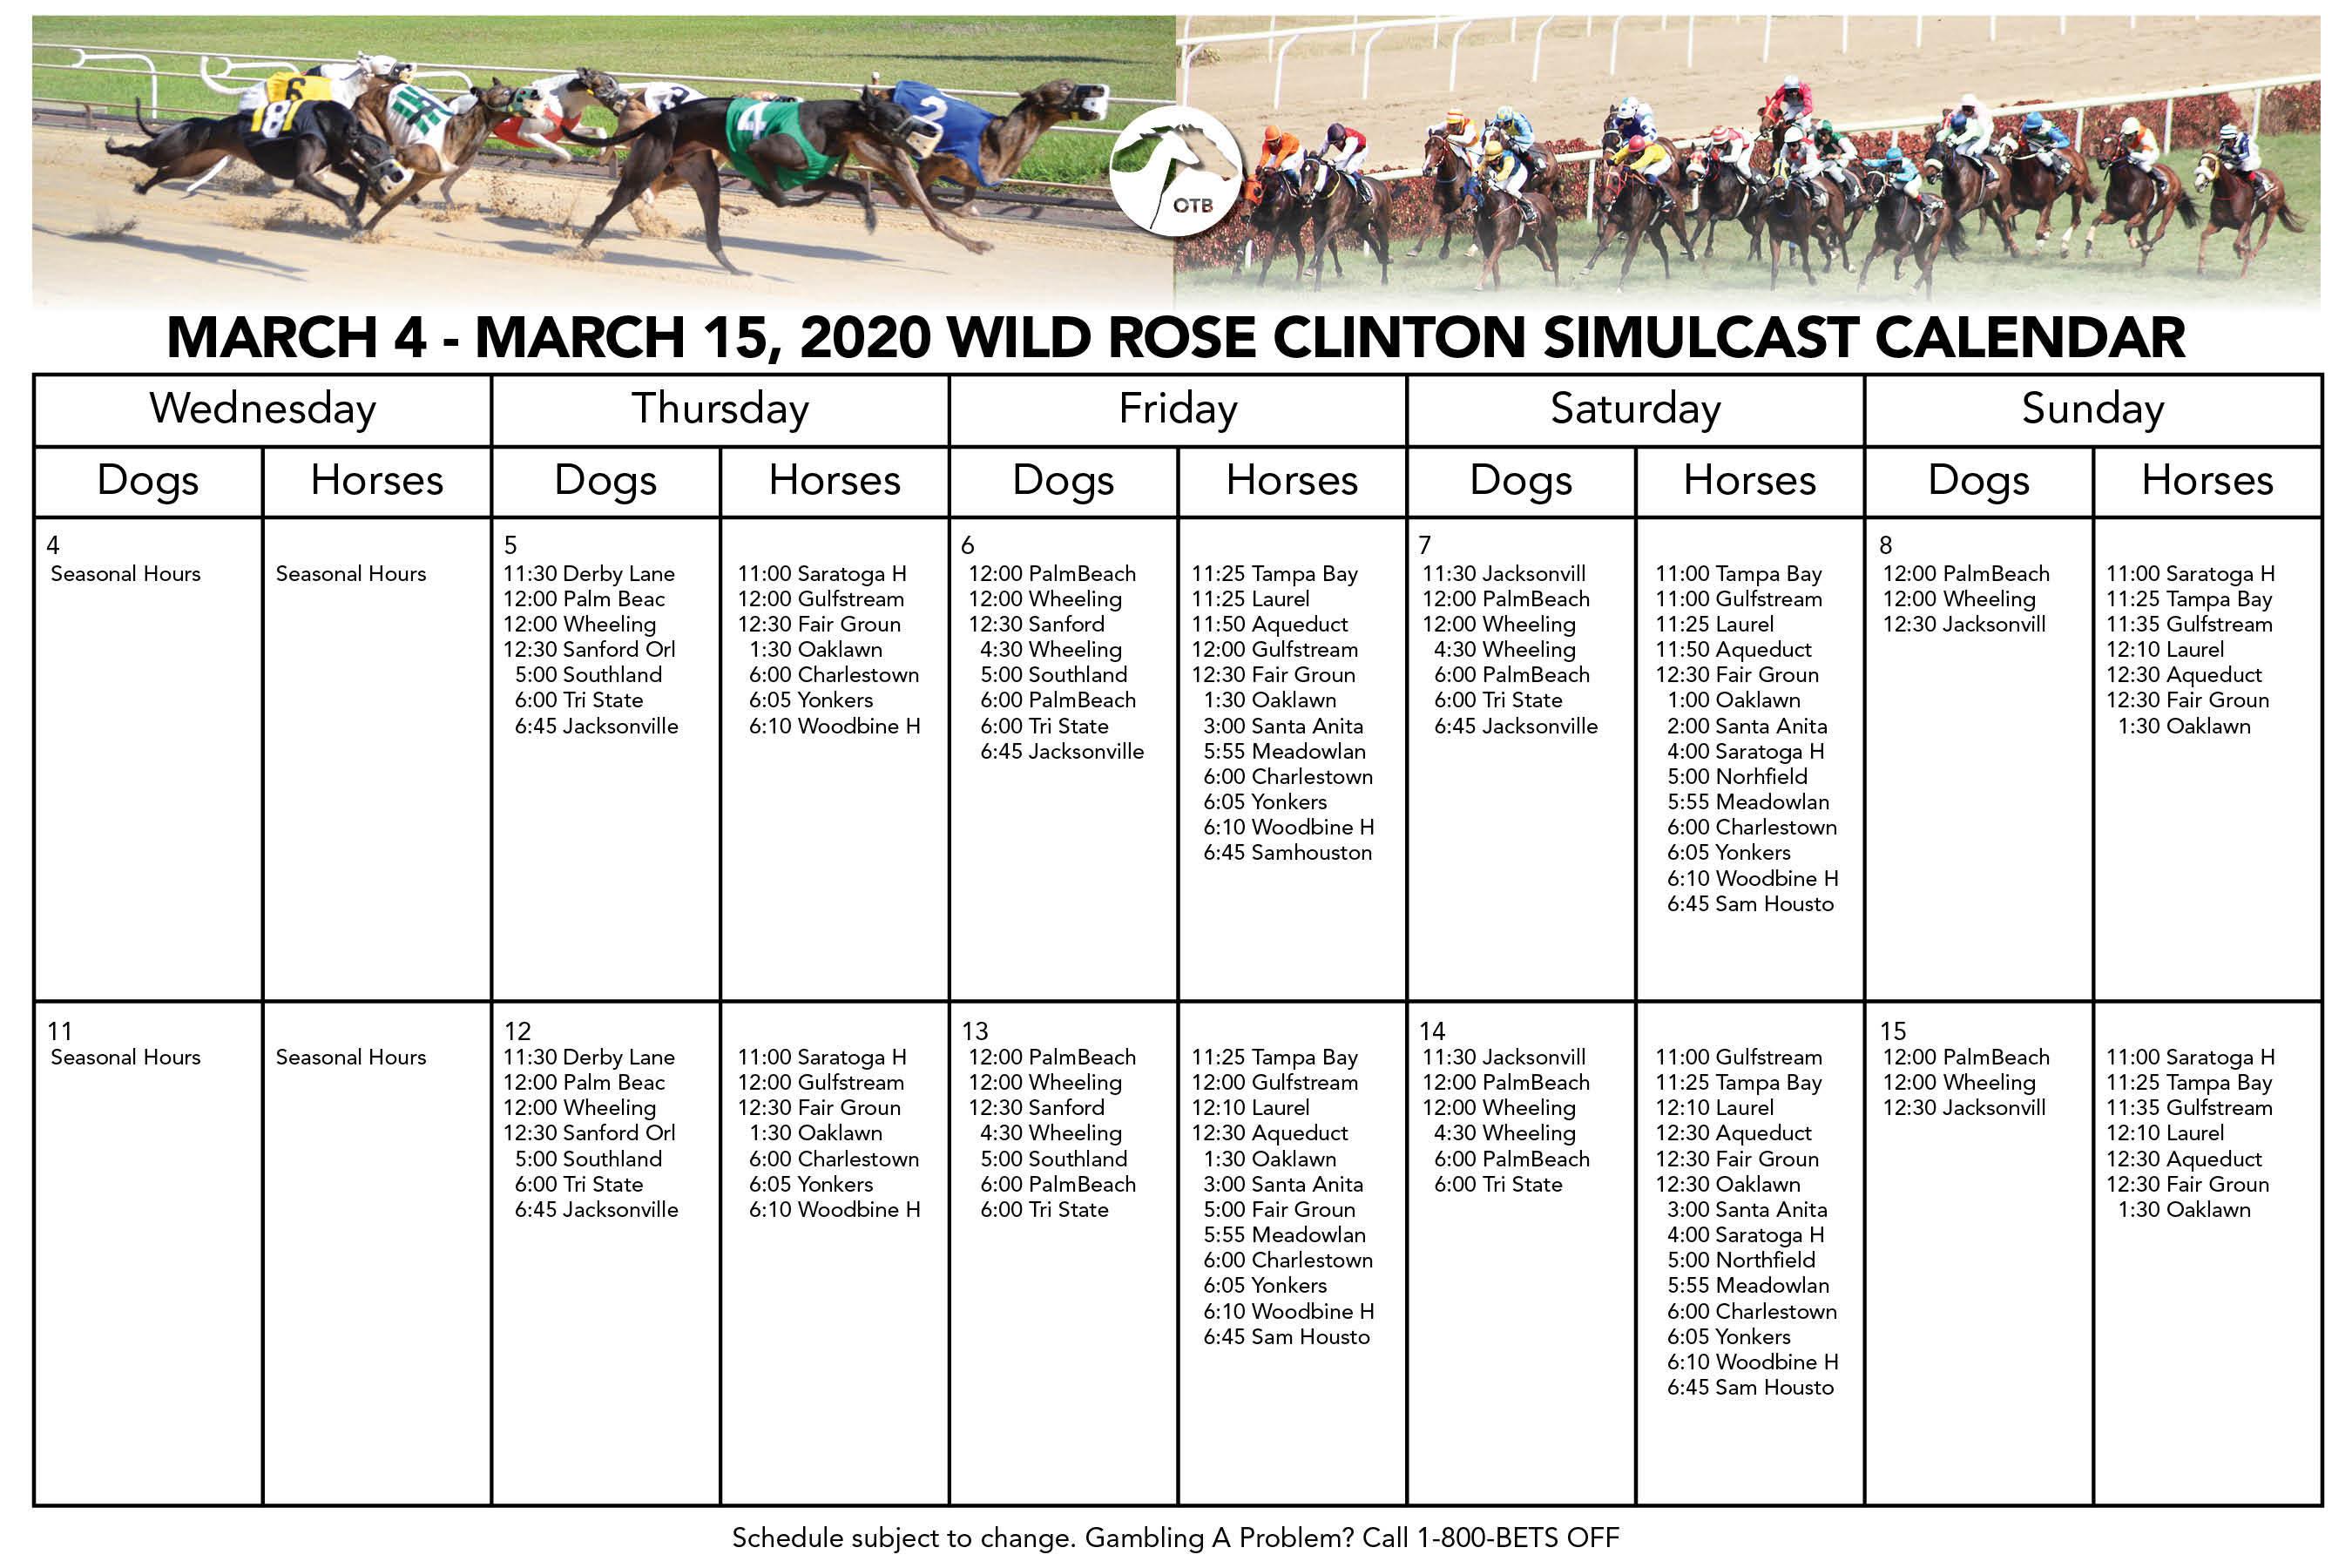 Racing | Wild Rose Casino And Resort Inside Tampa Bay Downs Race Track Calendar